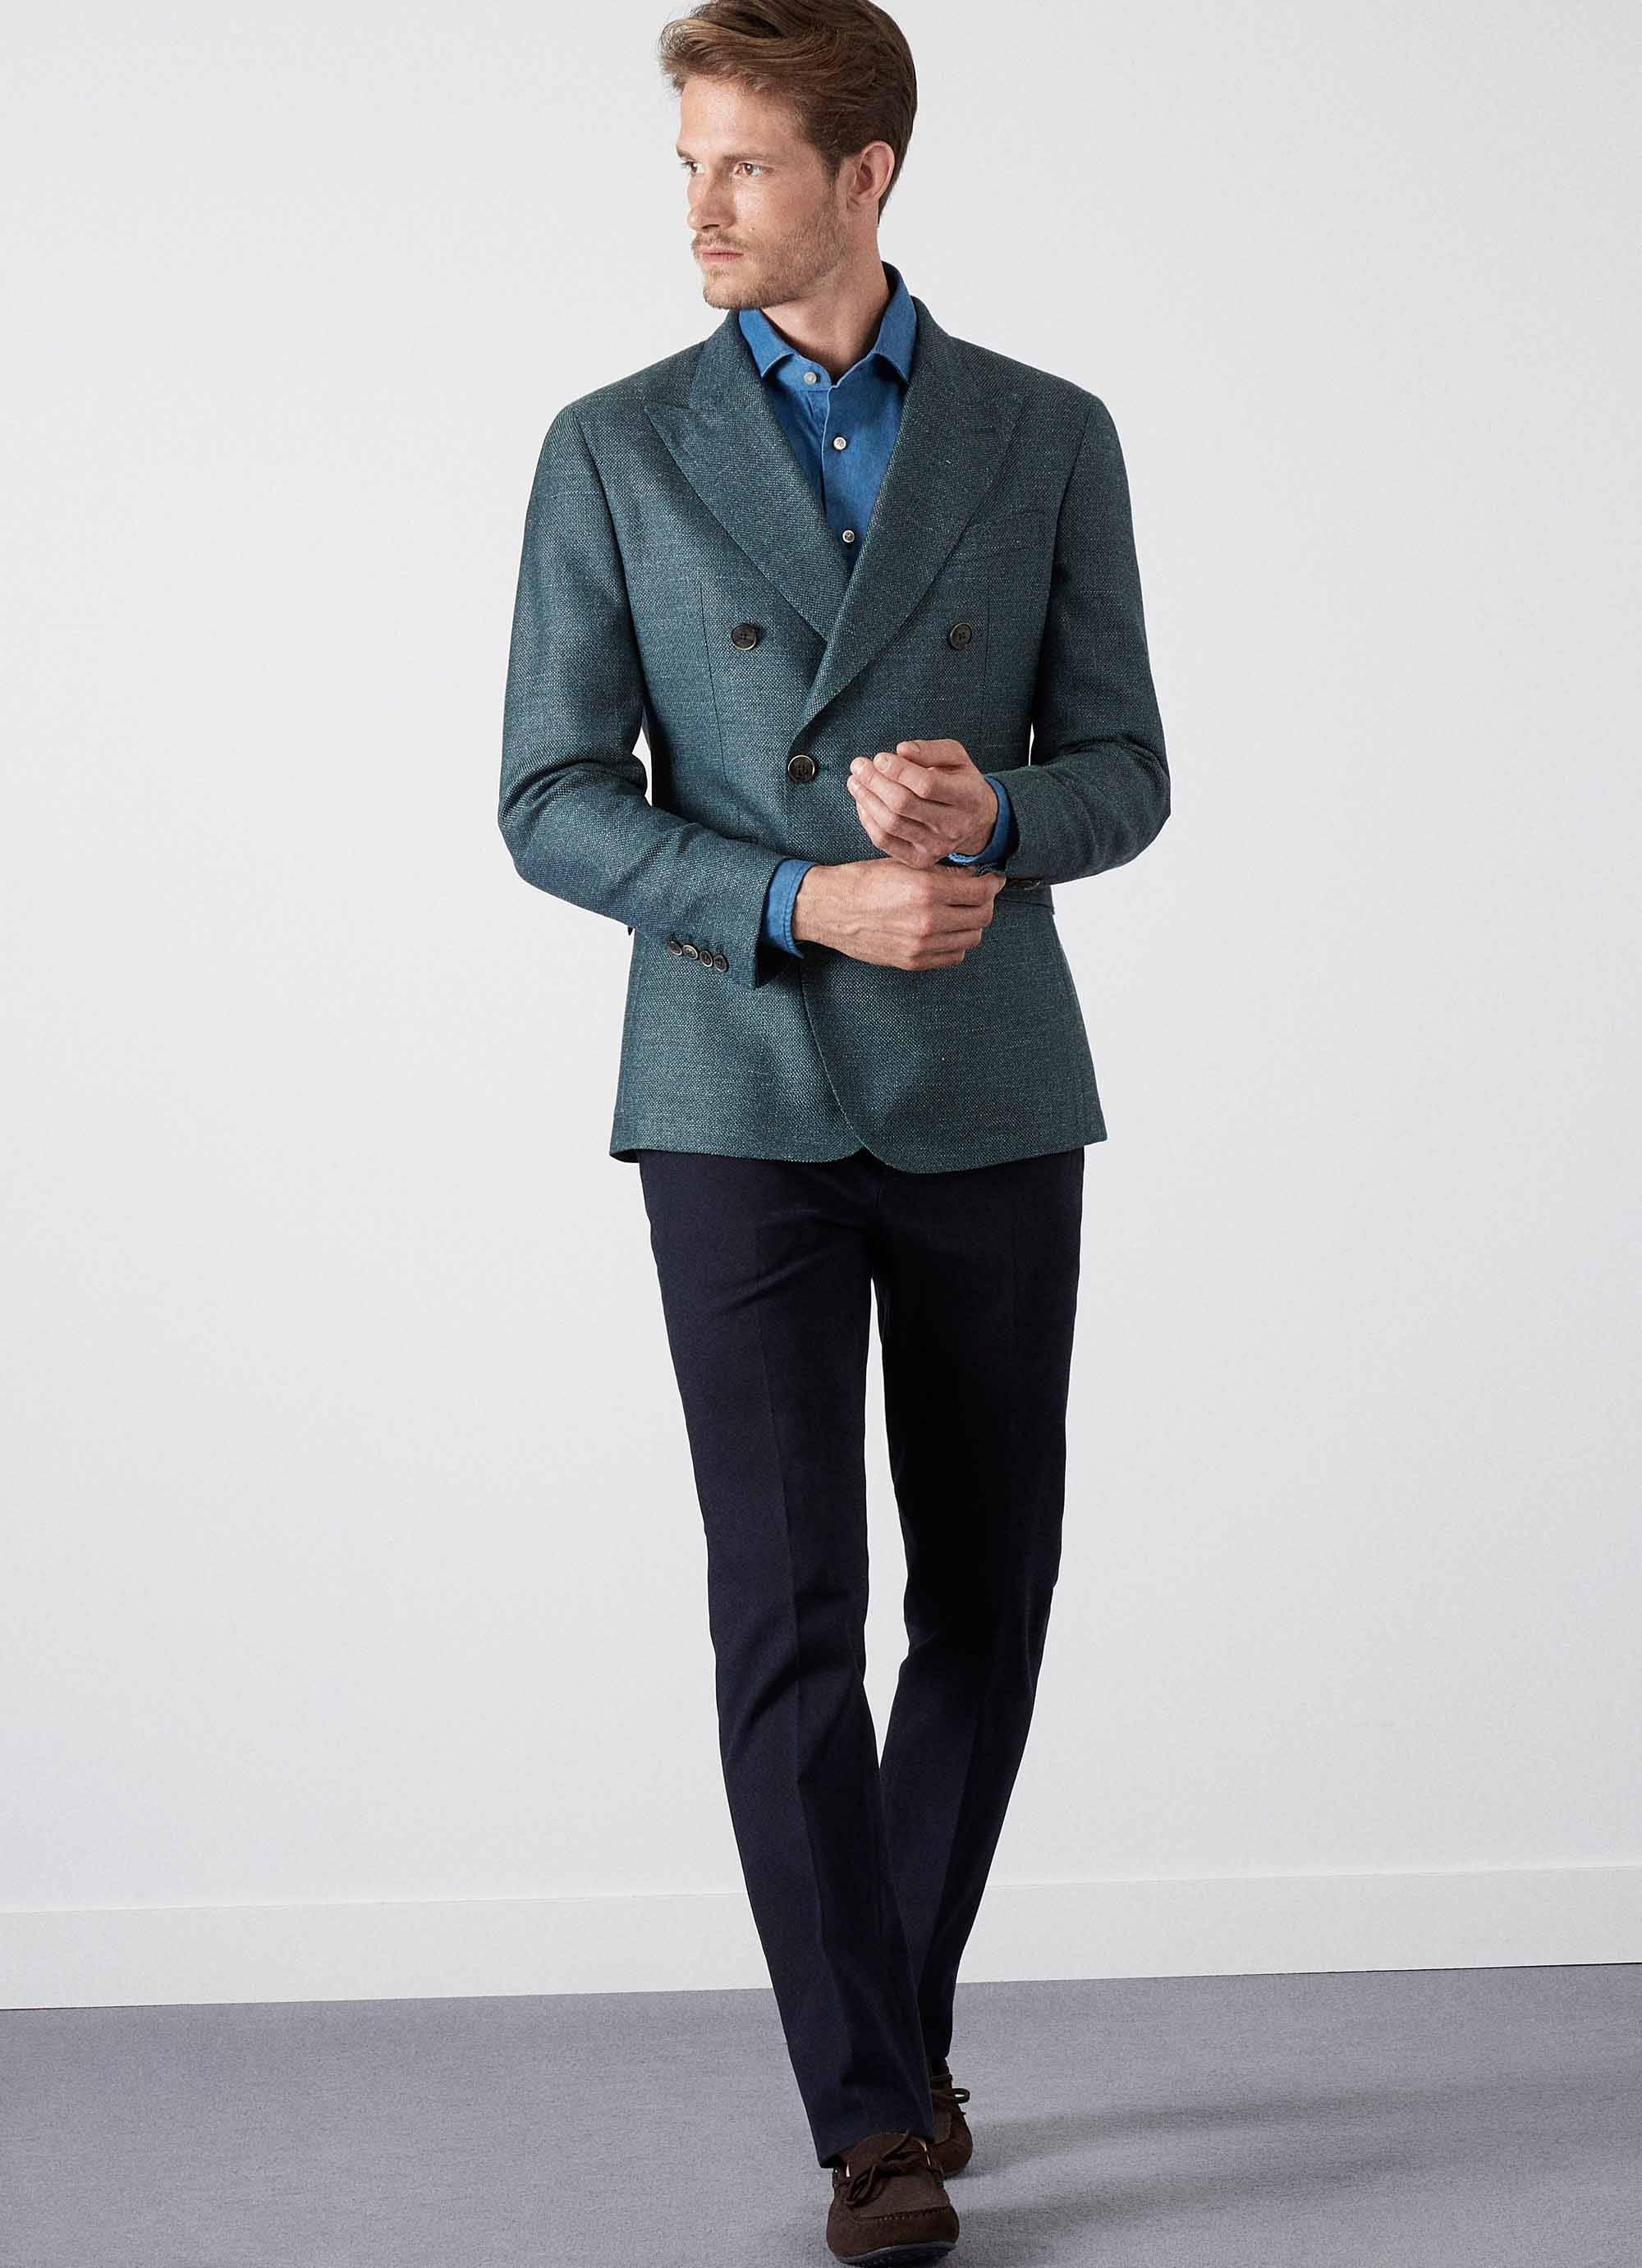 bdcd9cf5507c Hackett Summer Tweed Double Breasted Jacket in Green for Men - Lyst